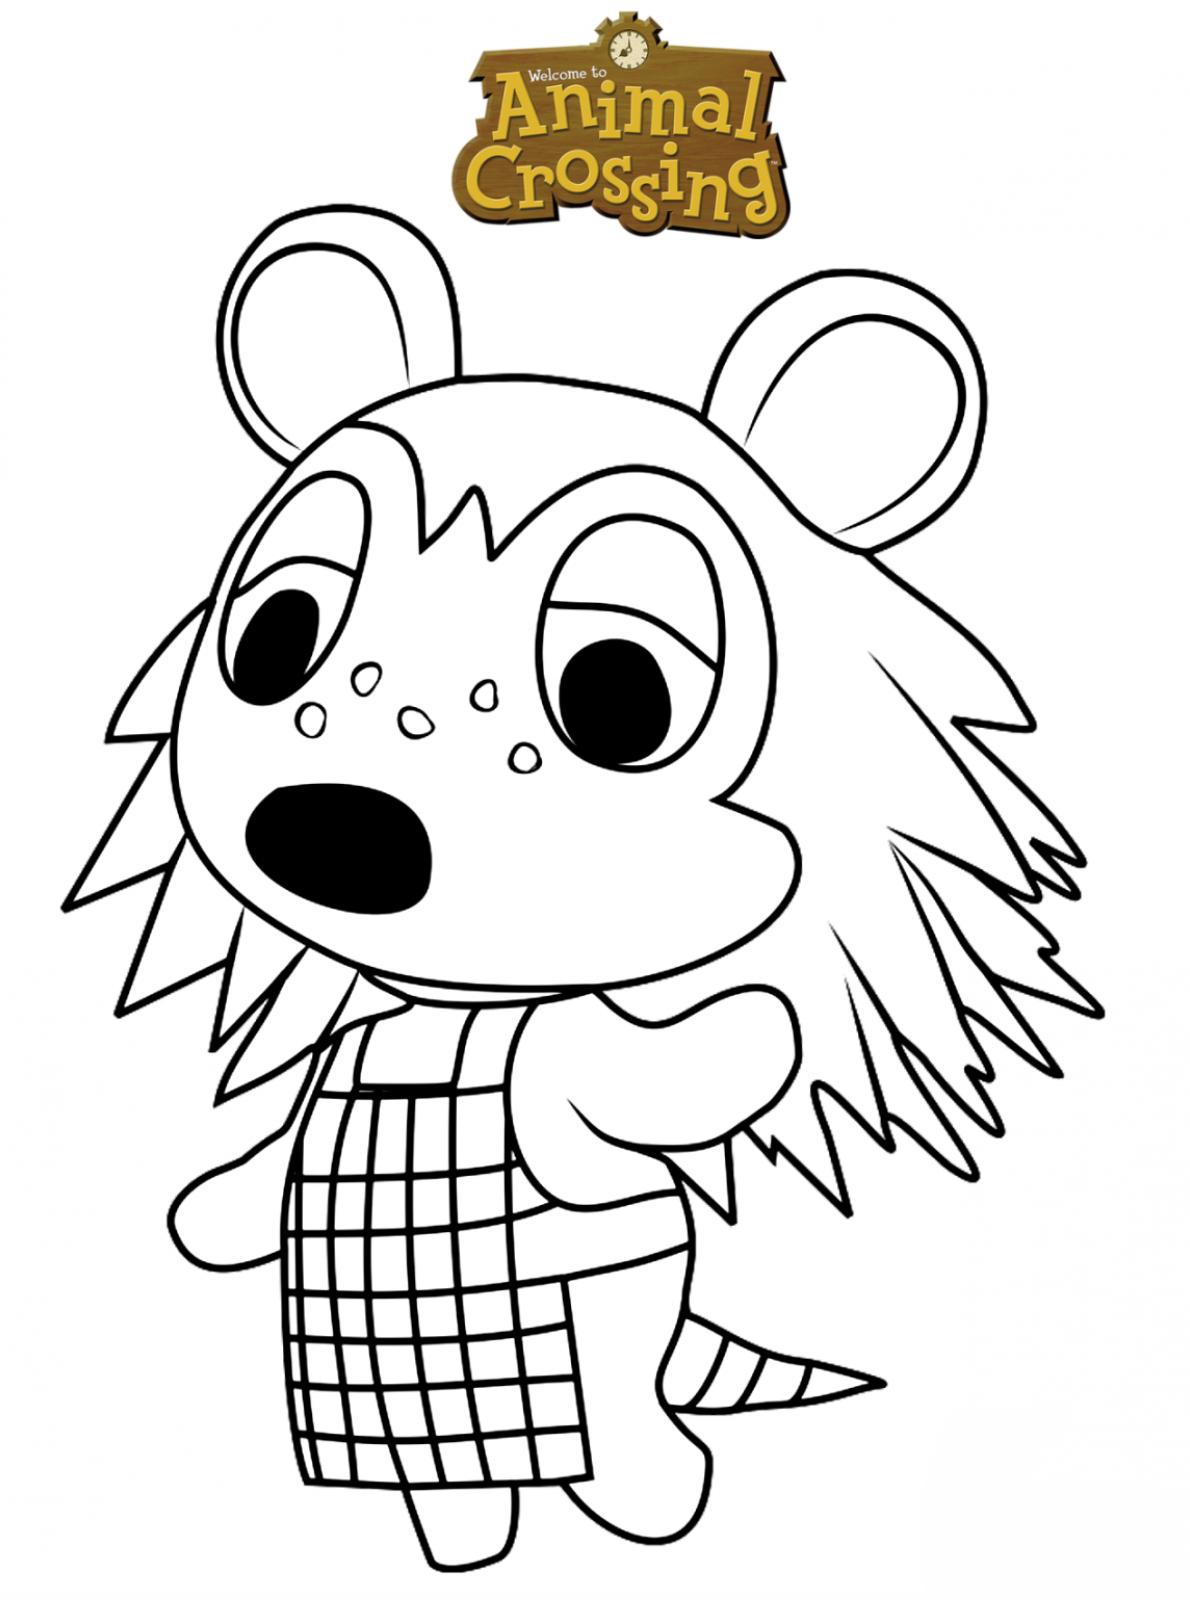 Kids-n-fun.com | Coloring page Animal Crossing Sable